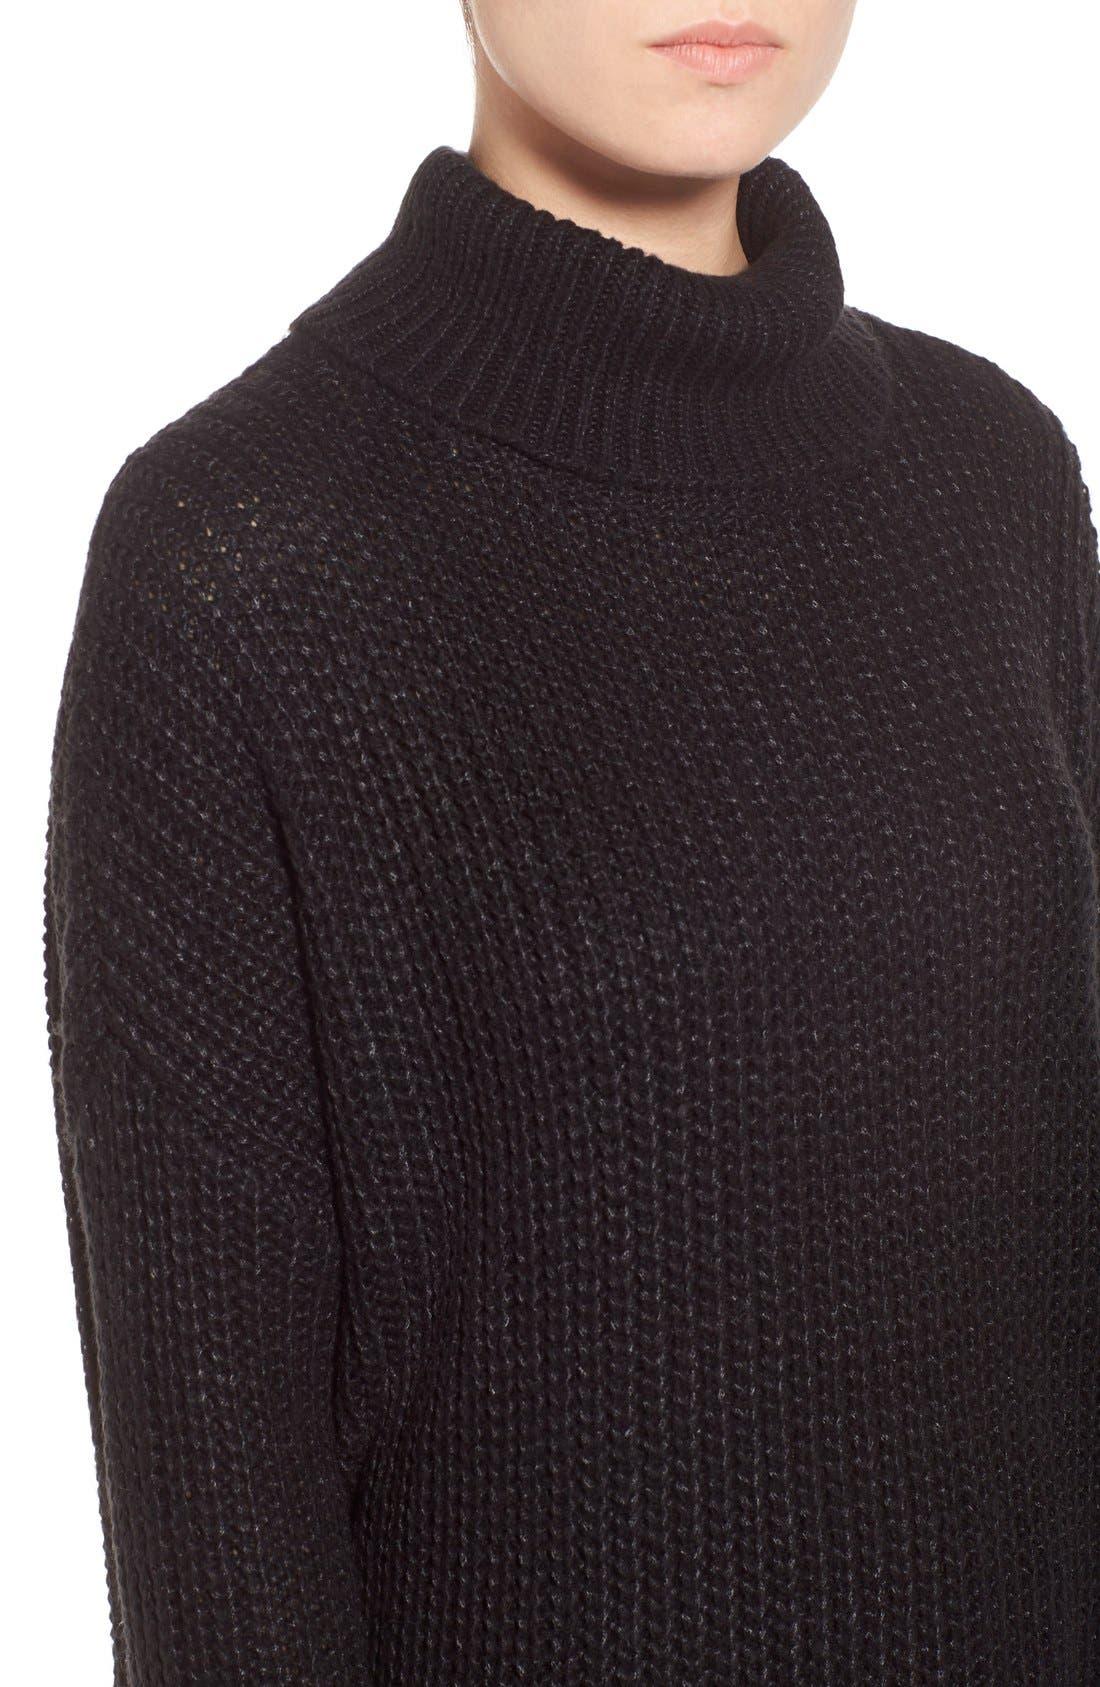 Oversize Turtleneck Sweater,                             Alternate thumbnail 4, color,                             001